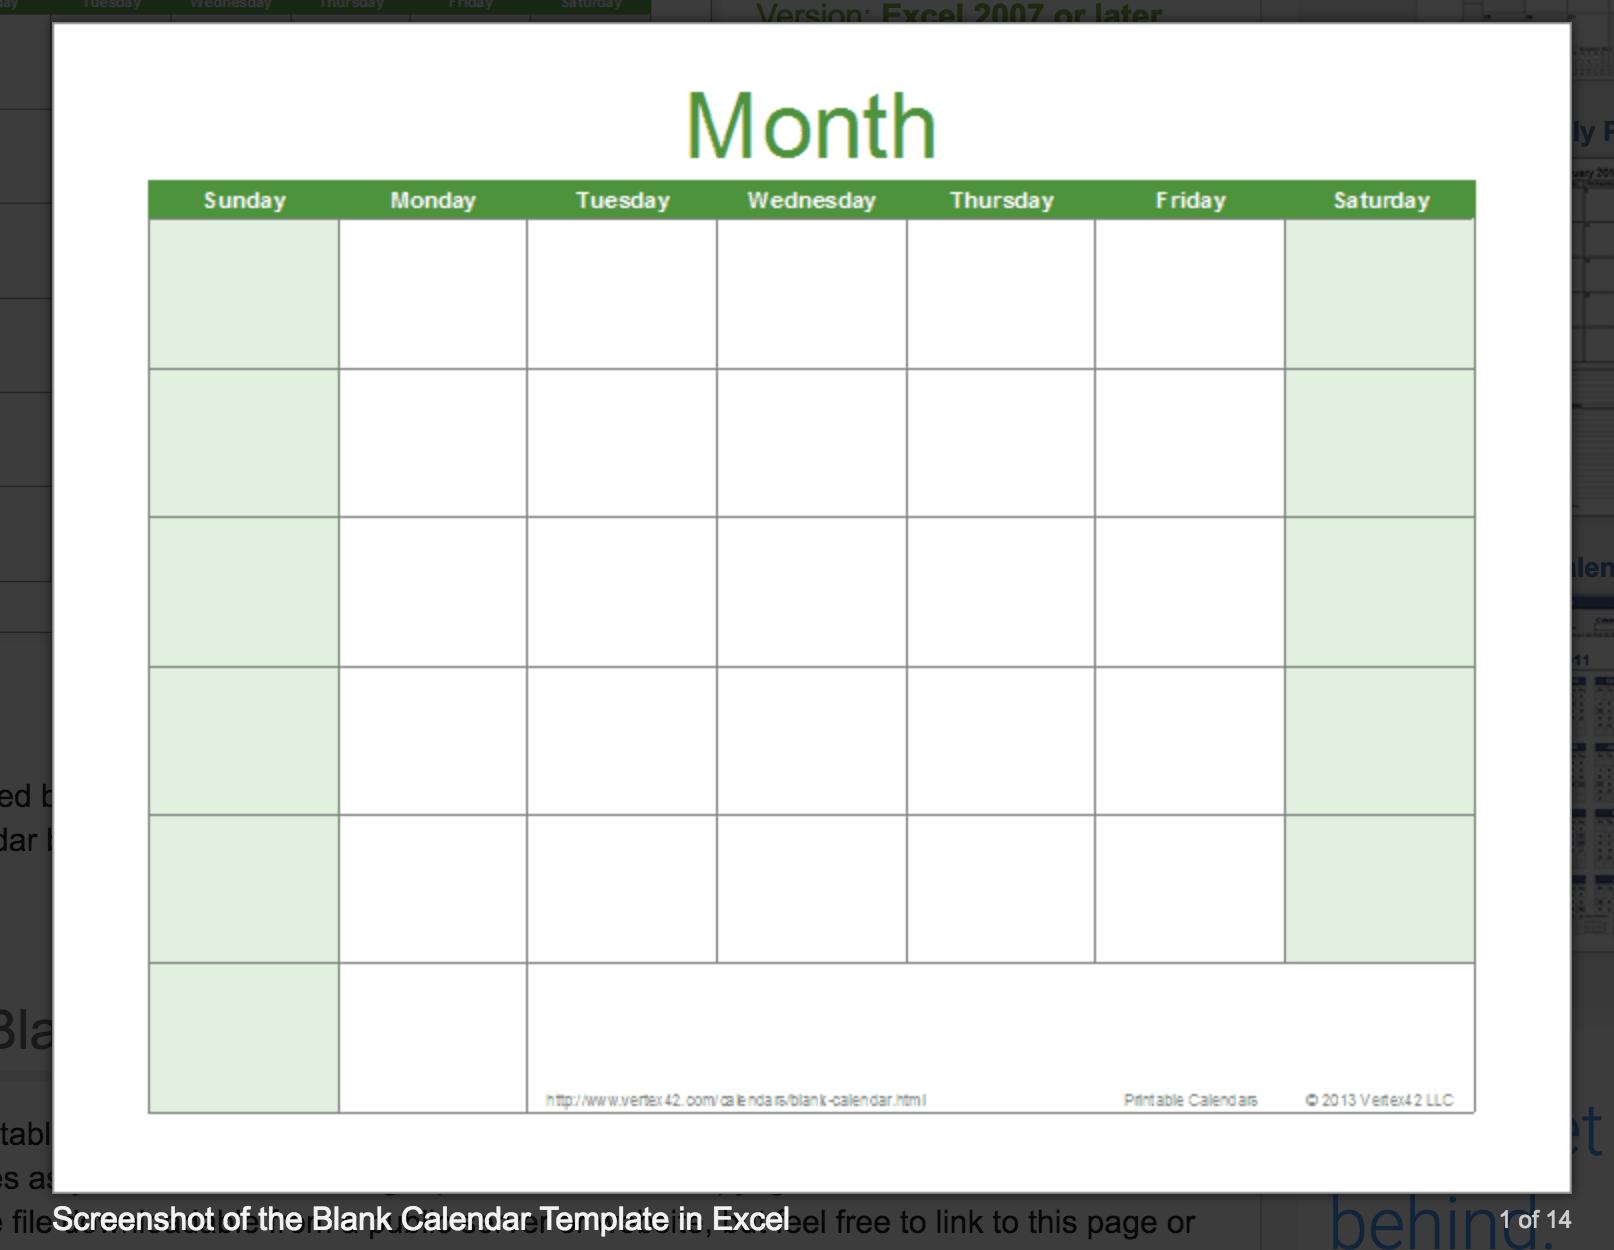 Blank Calendar: Wonderfully Printable 2019 Templates in Free Blank Calendar Templates To Print